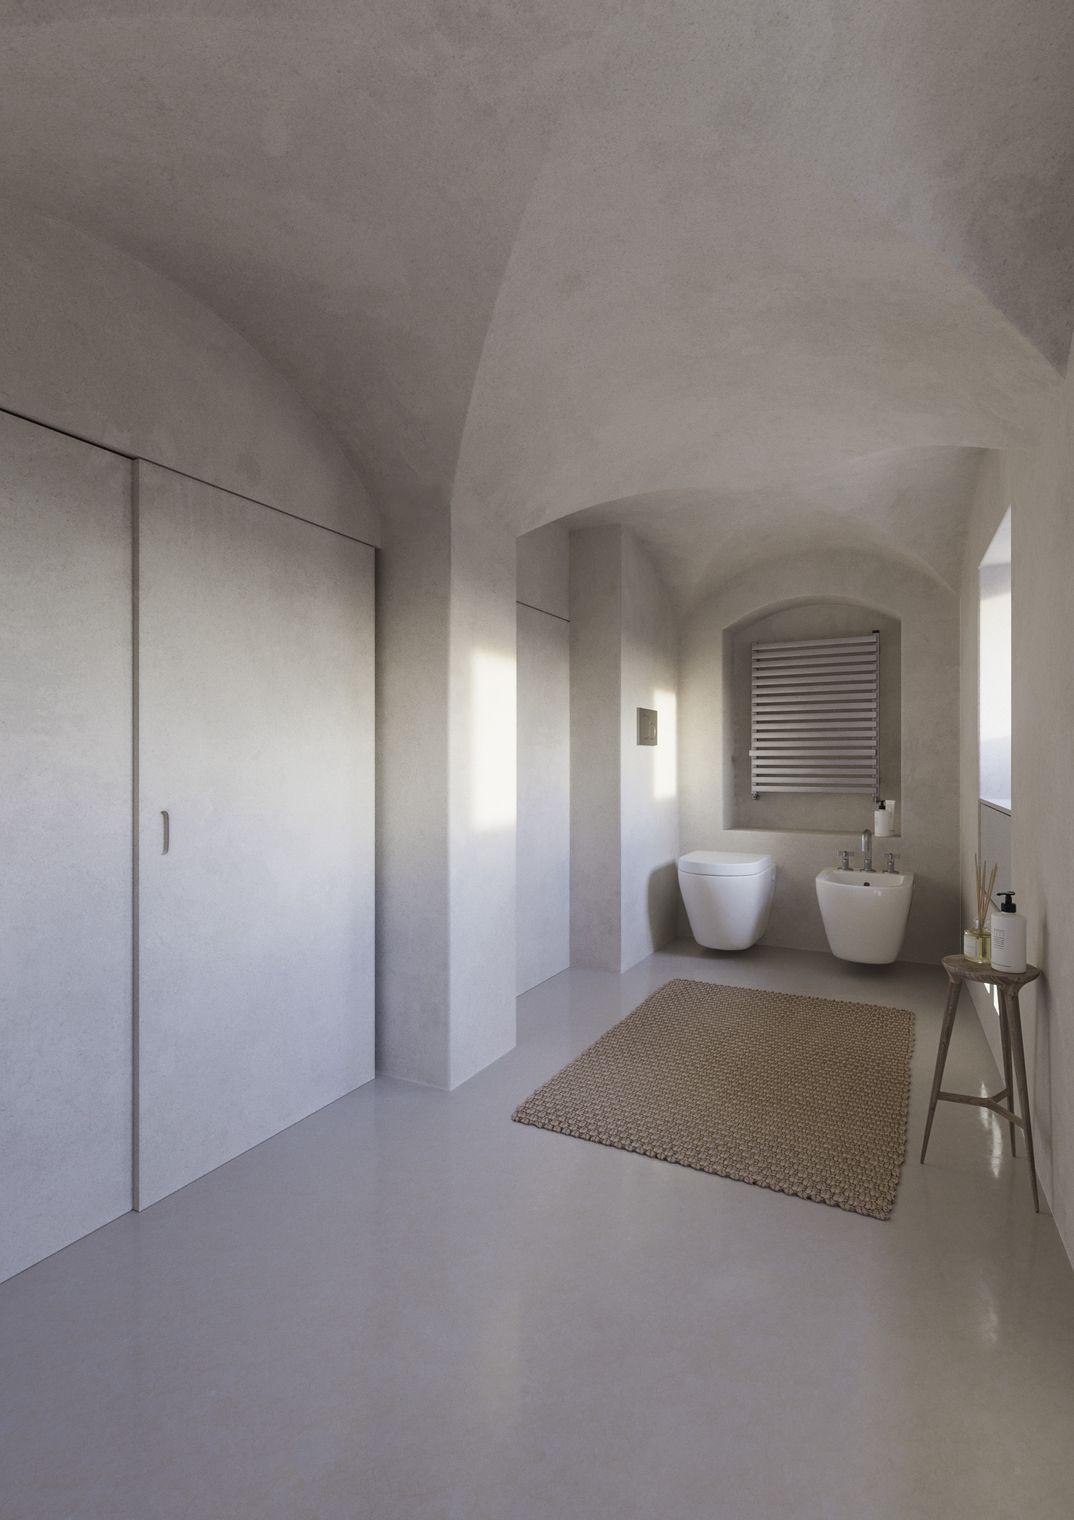 Palazzo Bardi - Santa Croce - FI